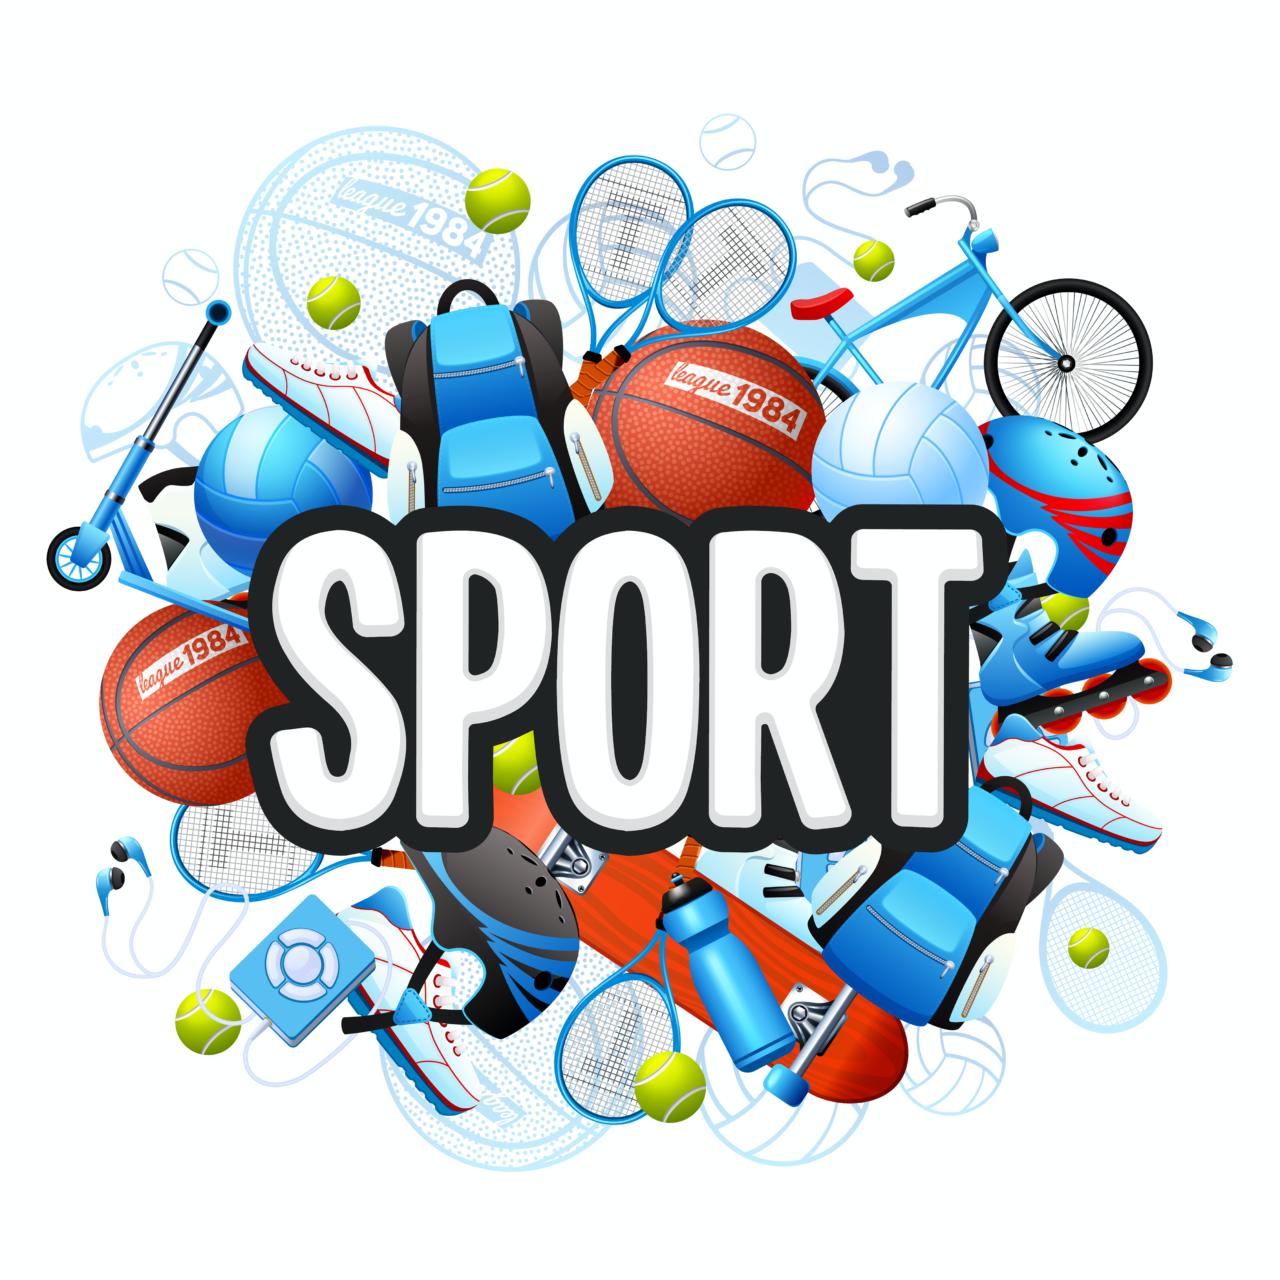 sport-1280x1280.png